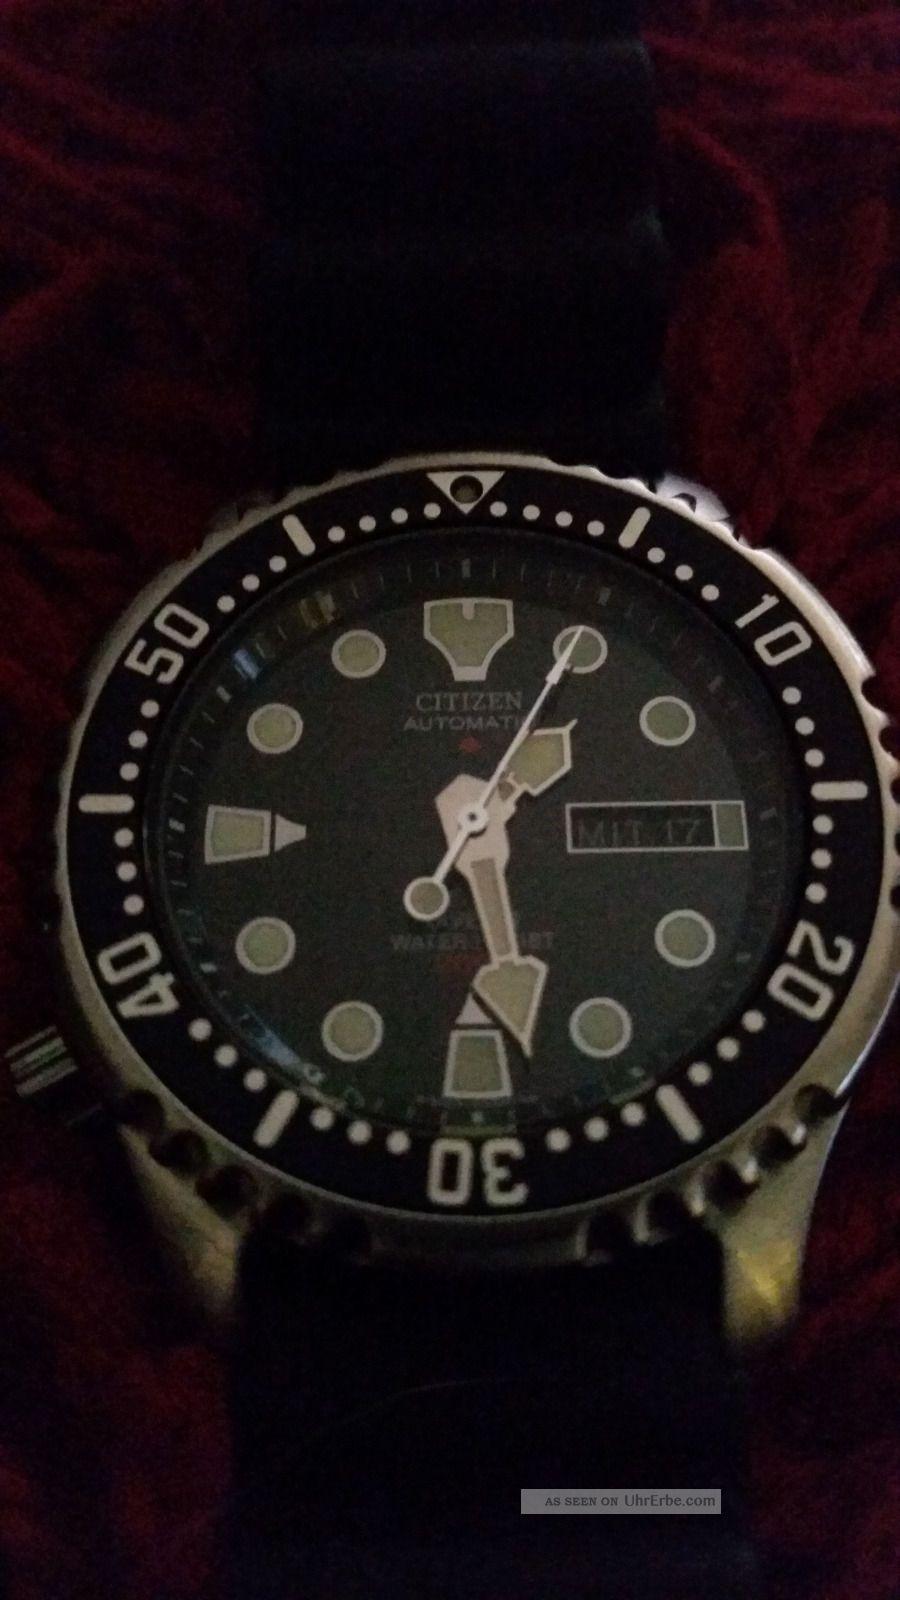 Citizen Promaster Automatic Marine Armbanduhr Für Herren. Armbanduhren Bild